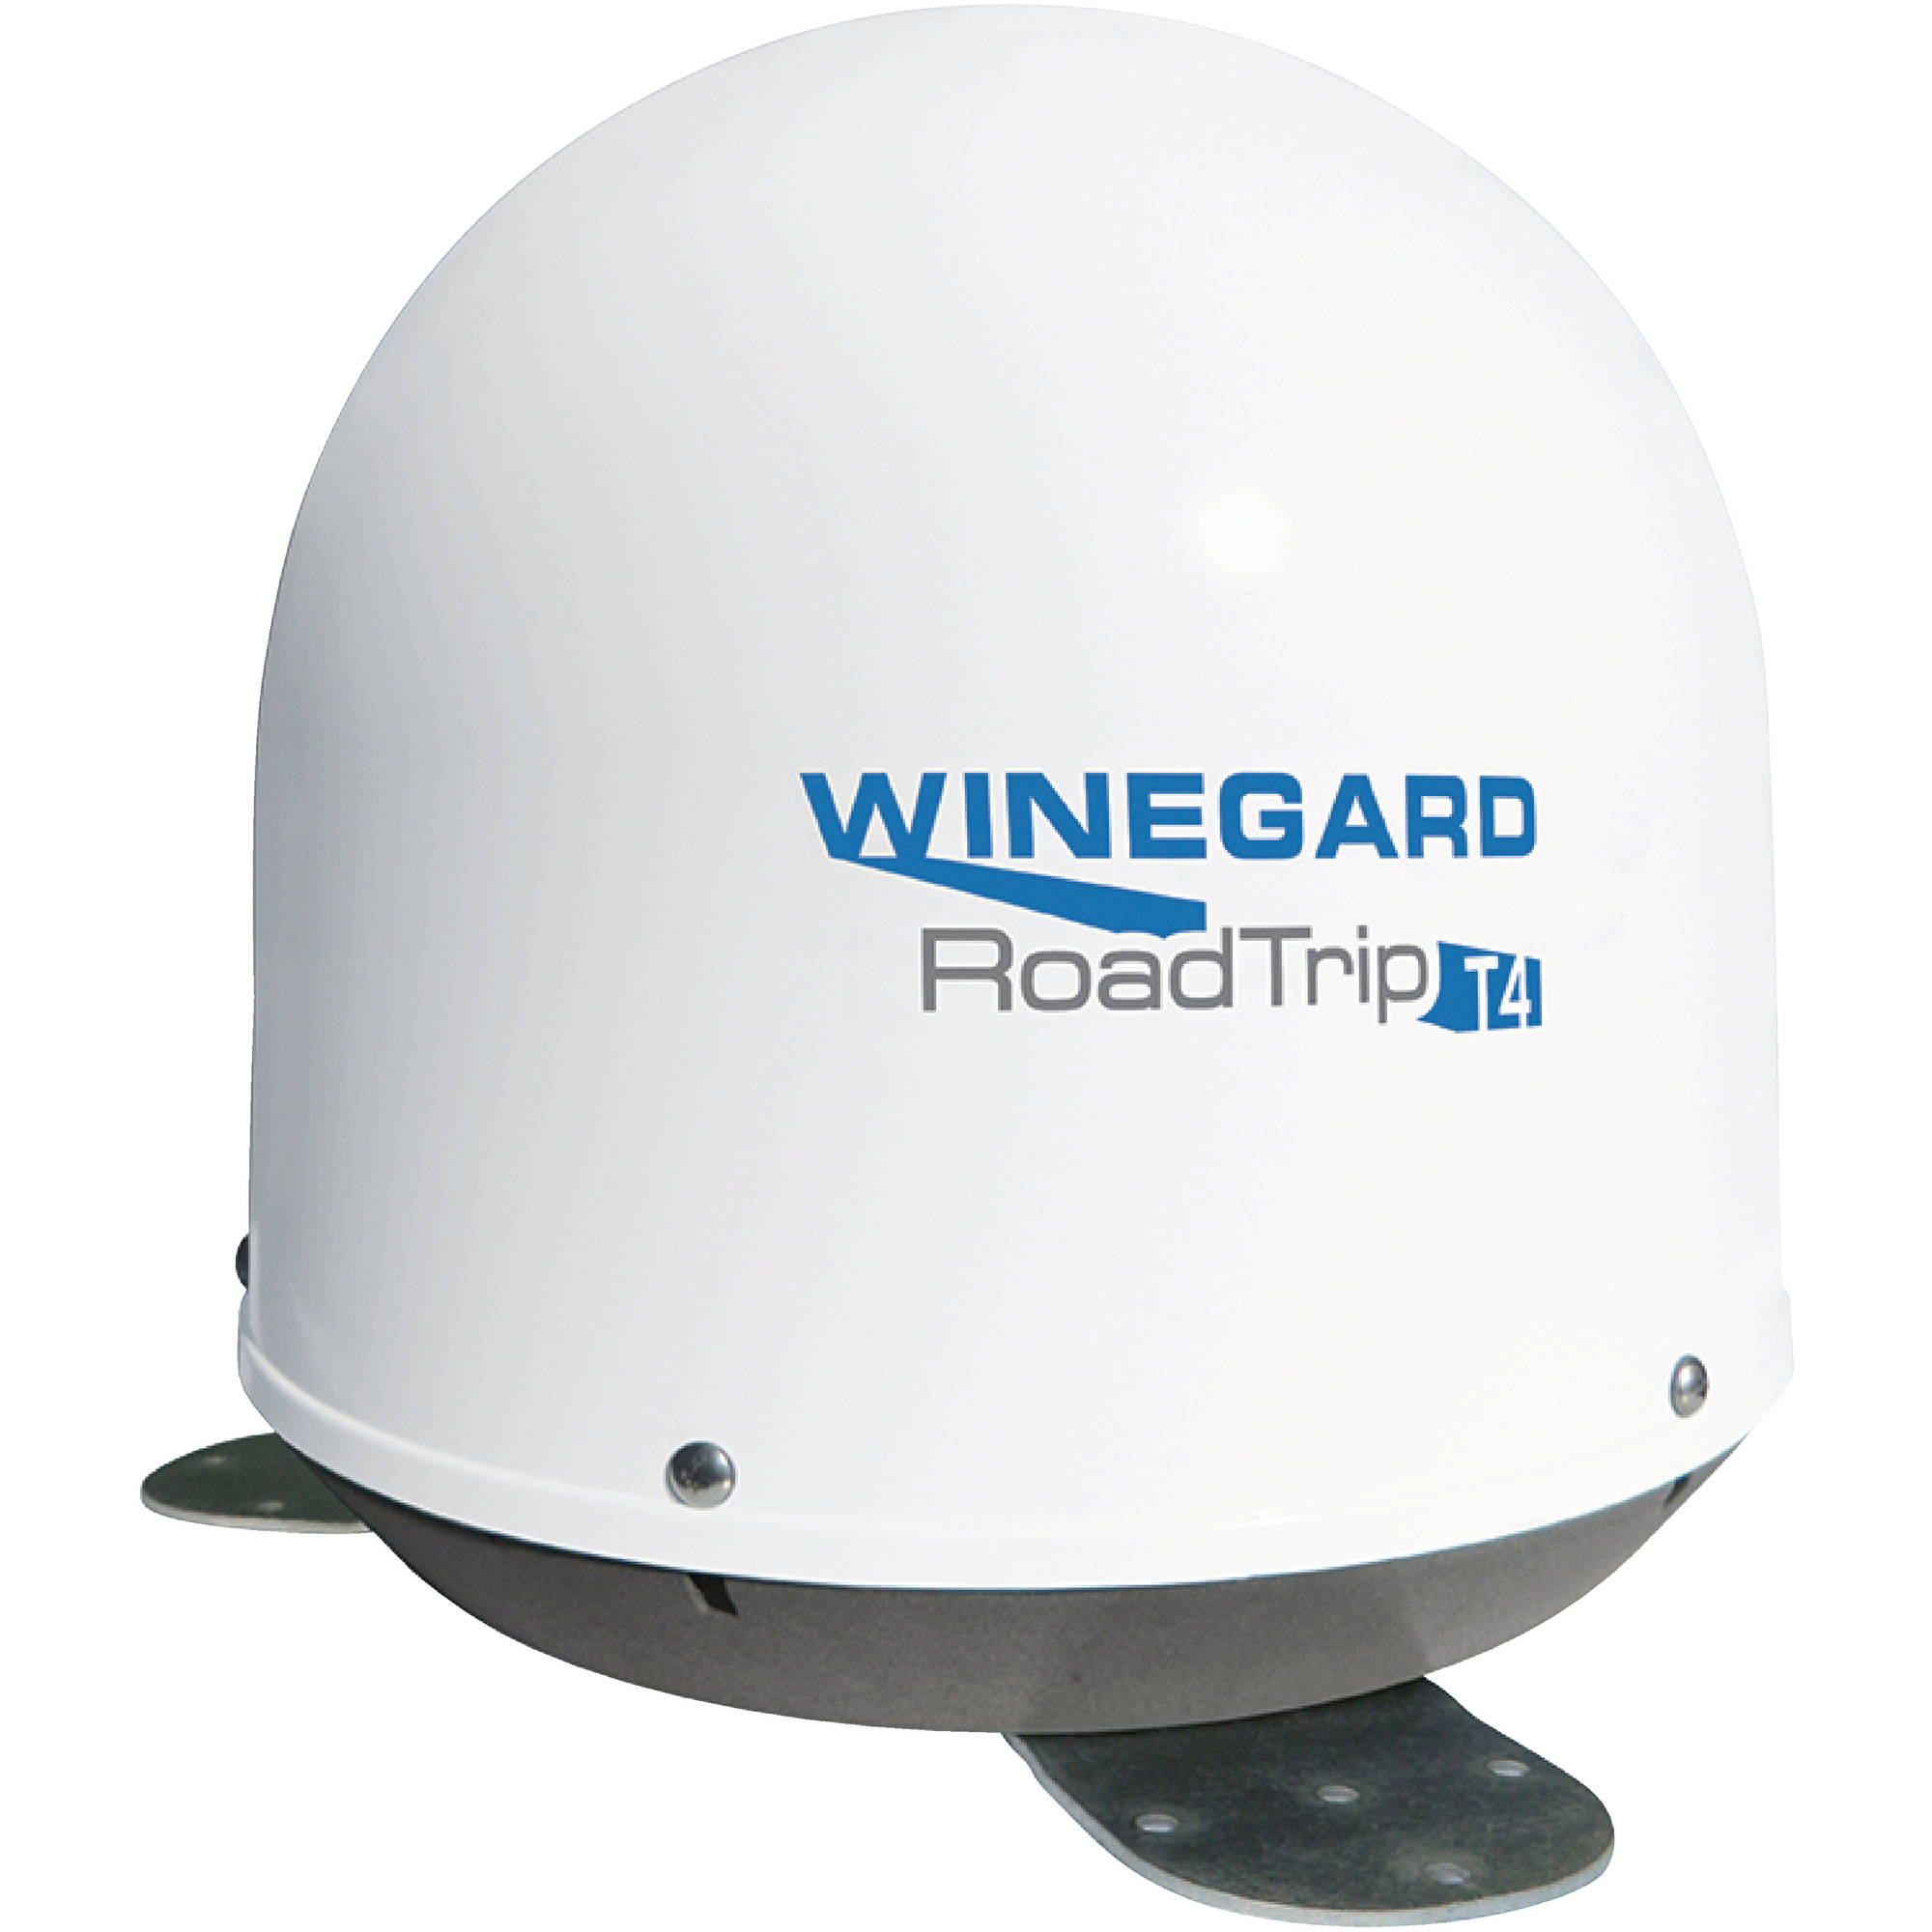 Winegard Roadtrip T4 In-Motion RV Satellite Antenna